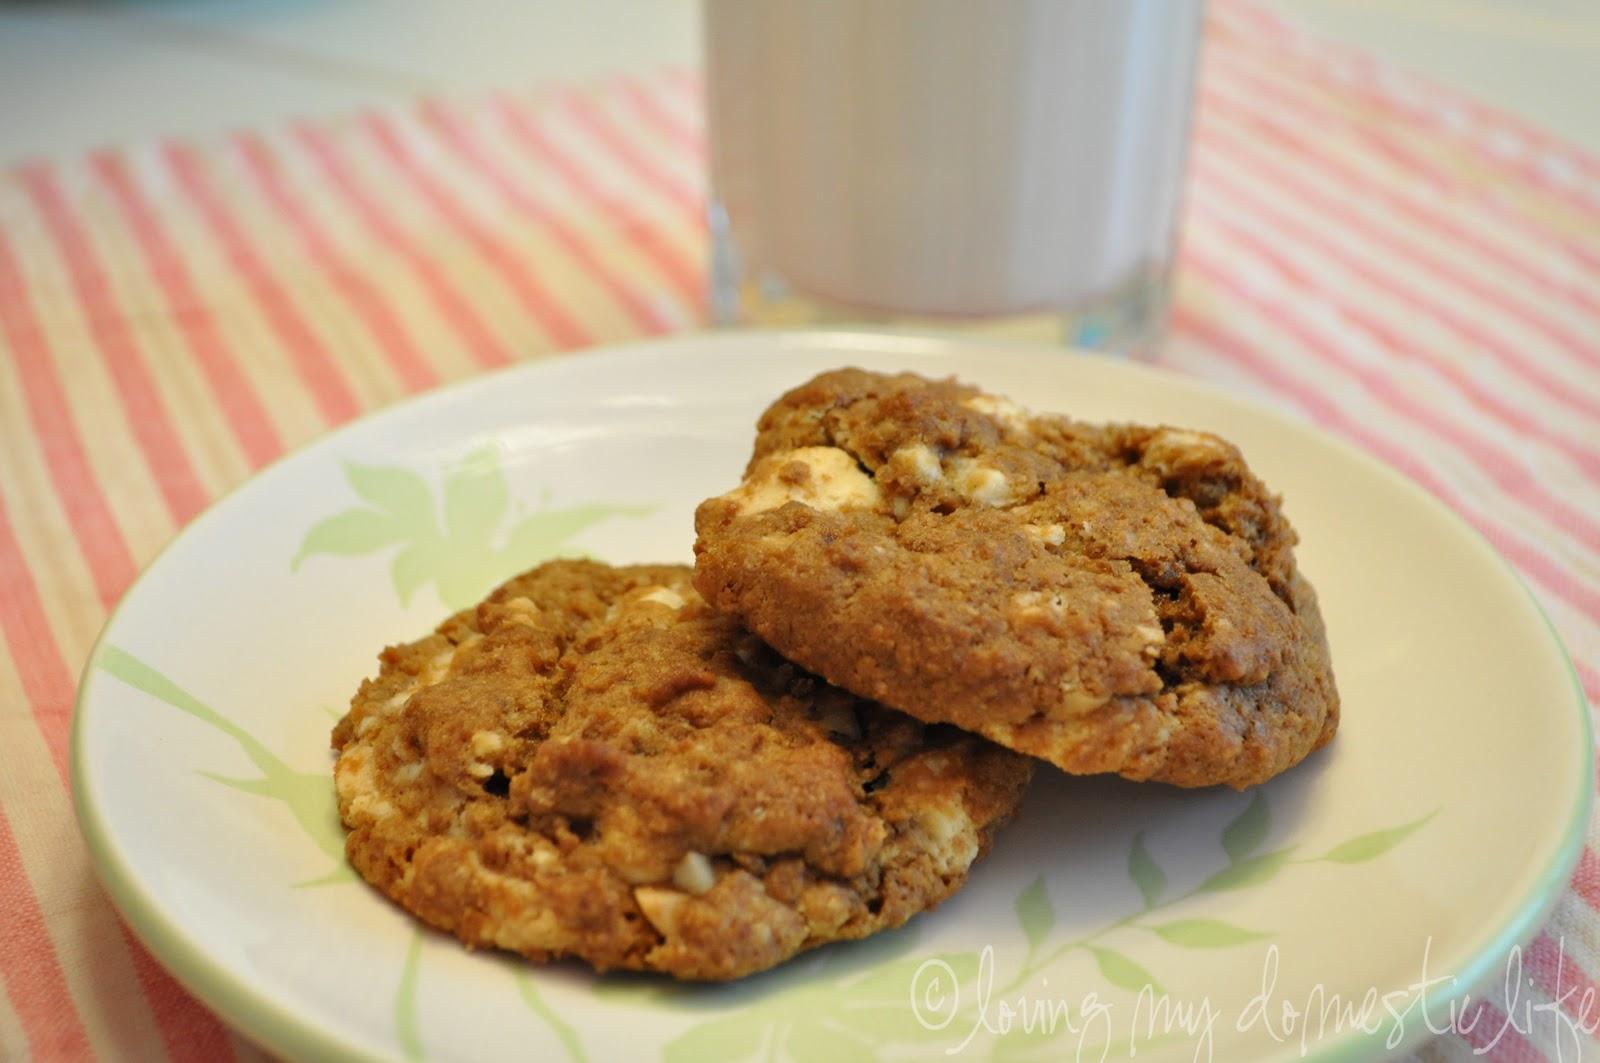 Loving My Domestic Life: White Chocolate Chunk Macadamia Cookies